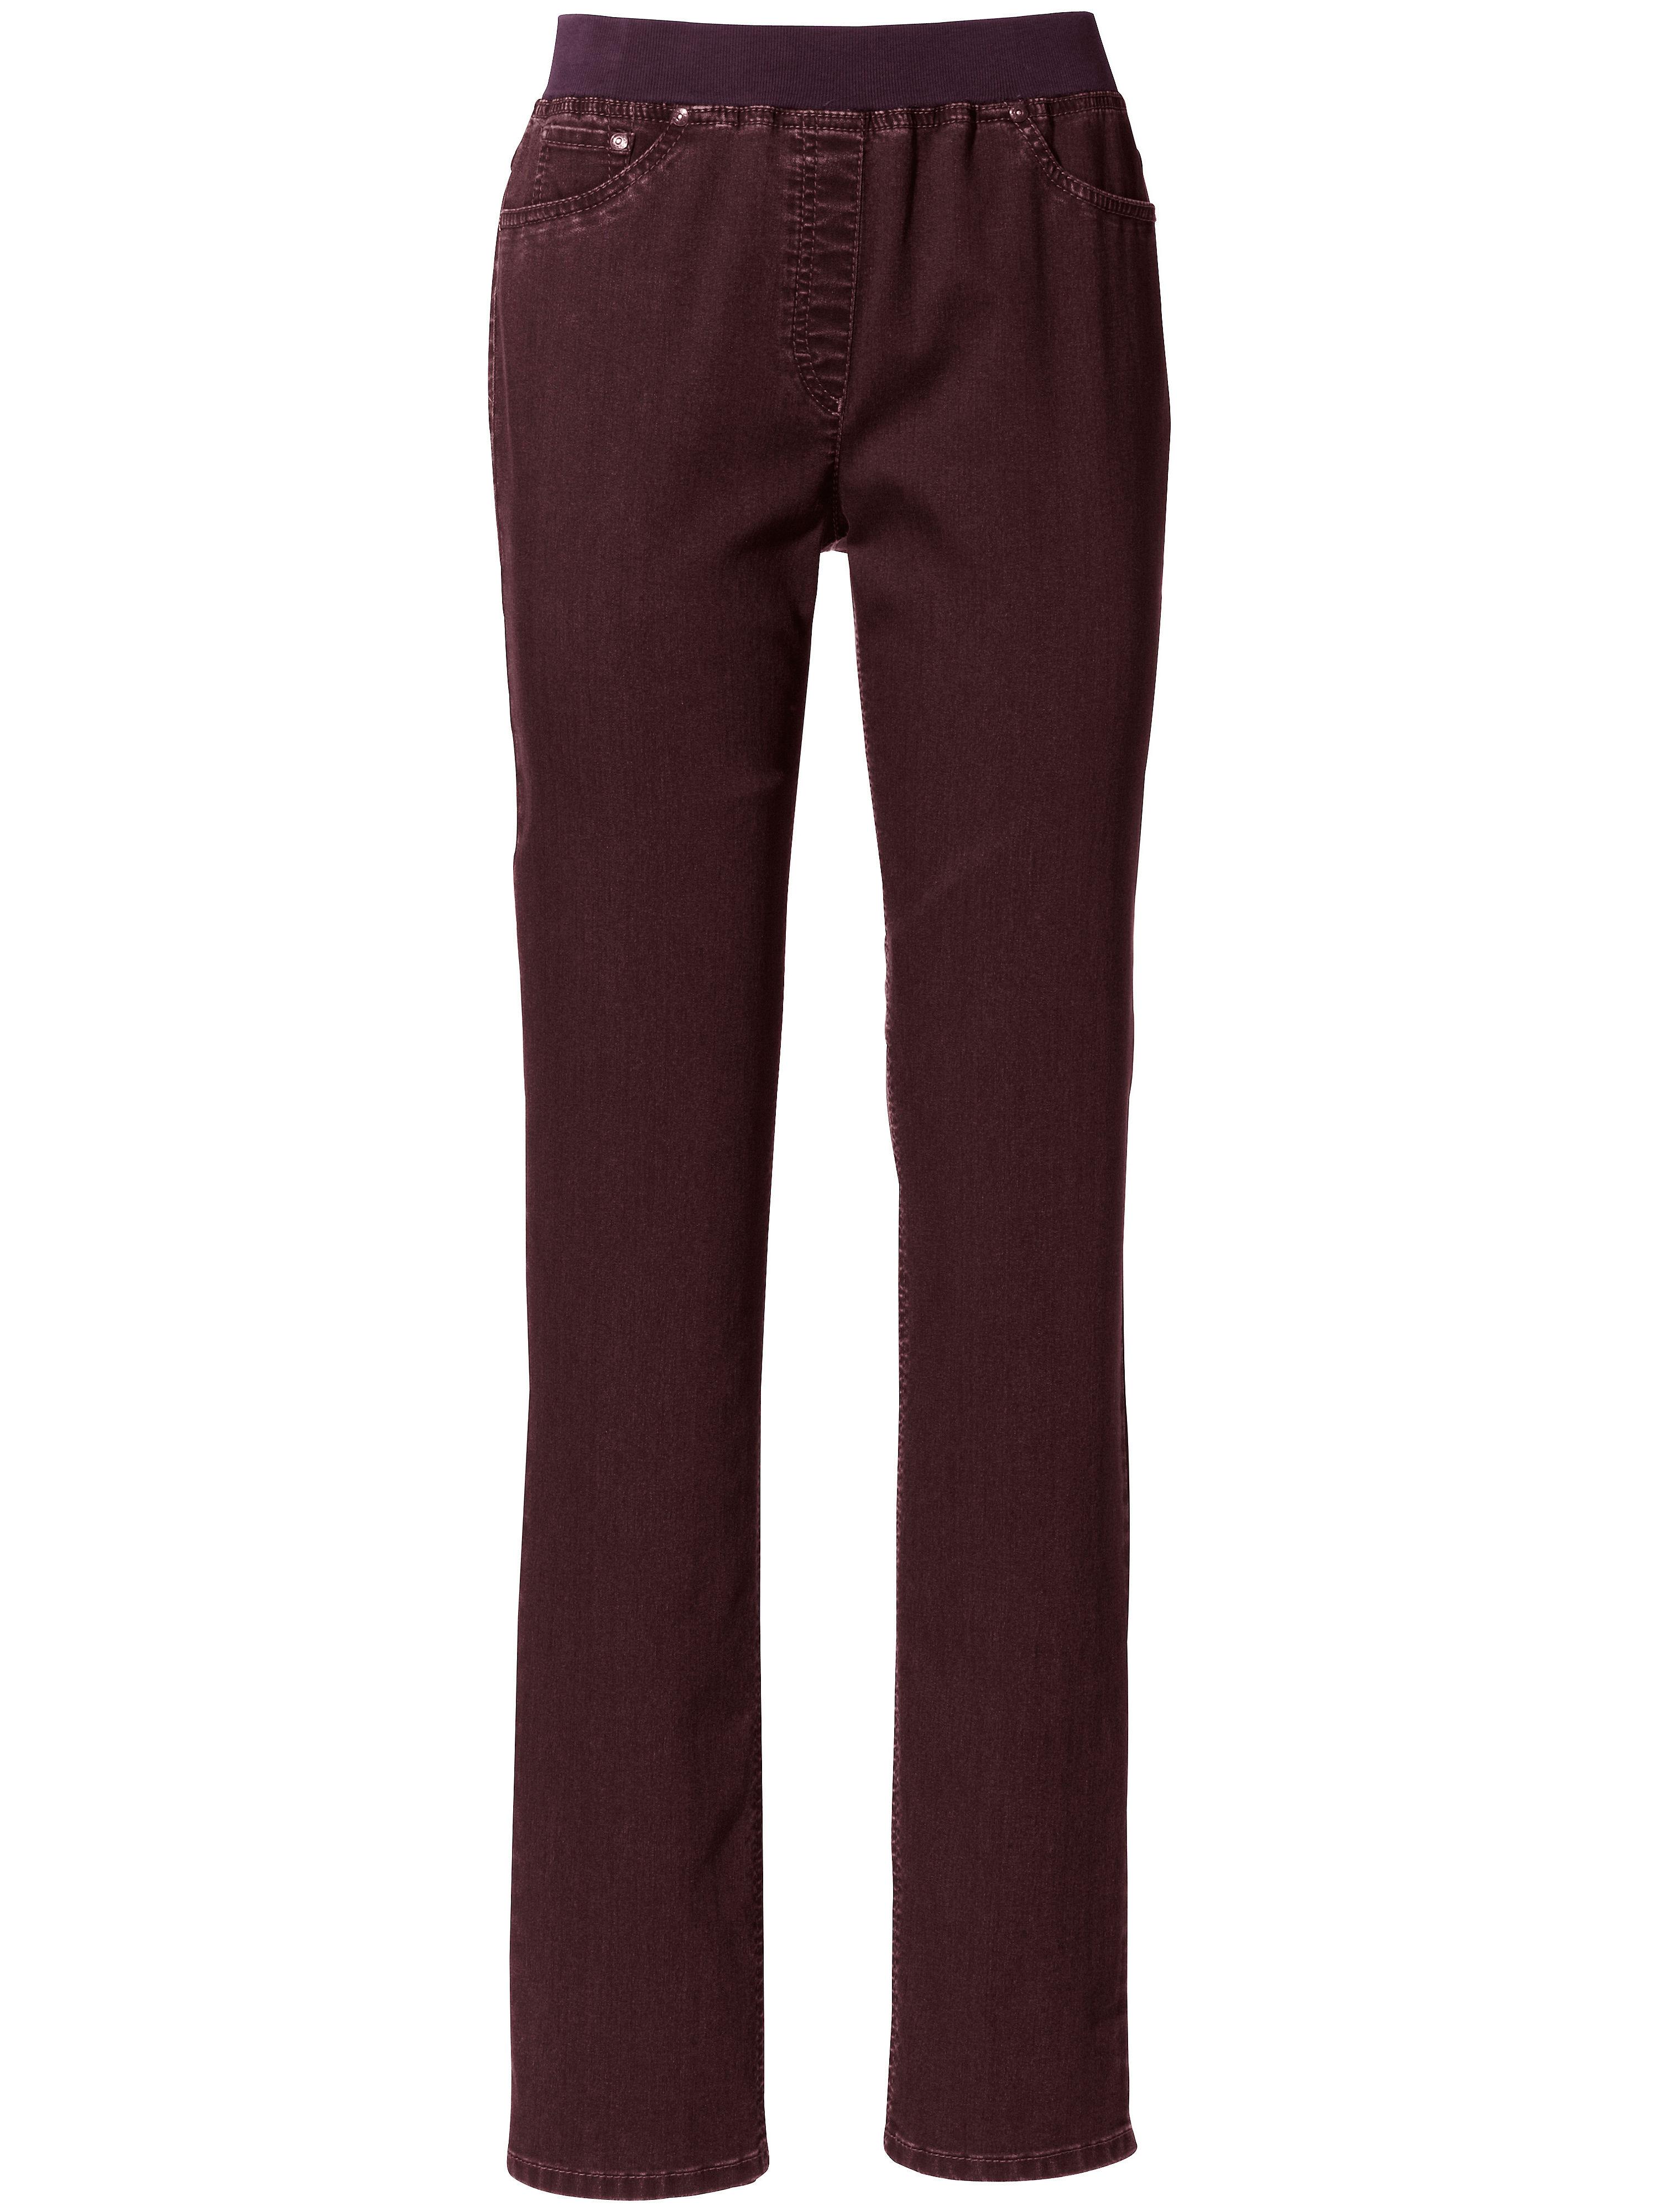 Image of   'ProForm Slim'-jeans, Raphaela by Brax, Pamina Fra Raphaela by Brax rød